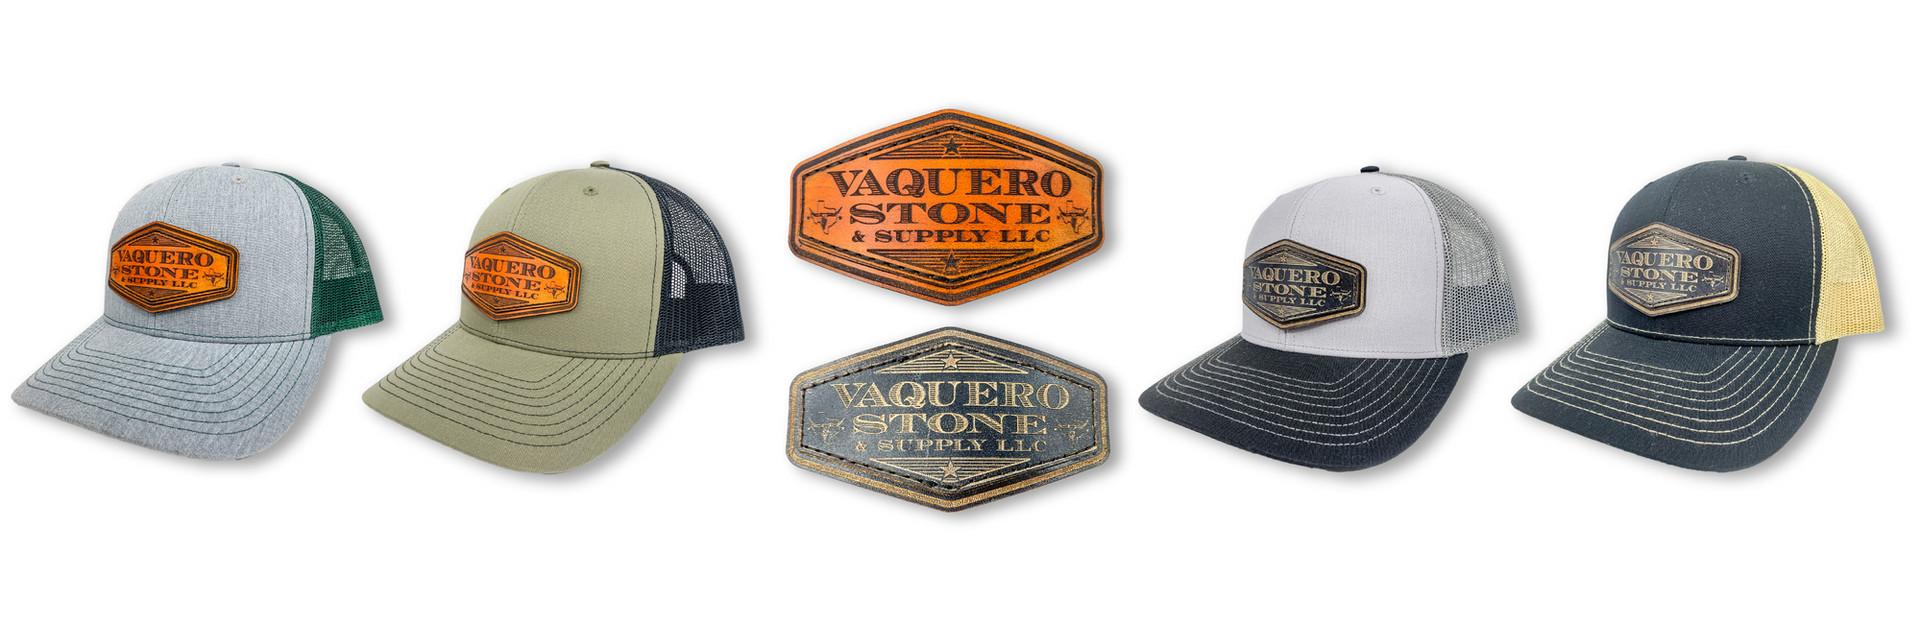 CUSTOM BRANDED LEATHER PATCHES | VAQUERO STONE